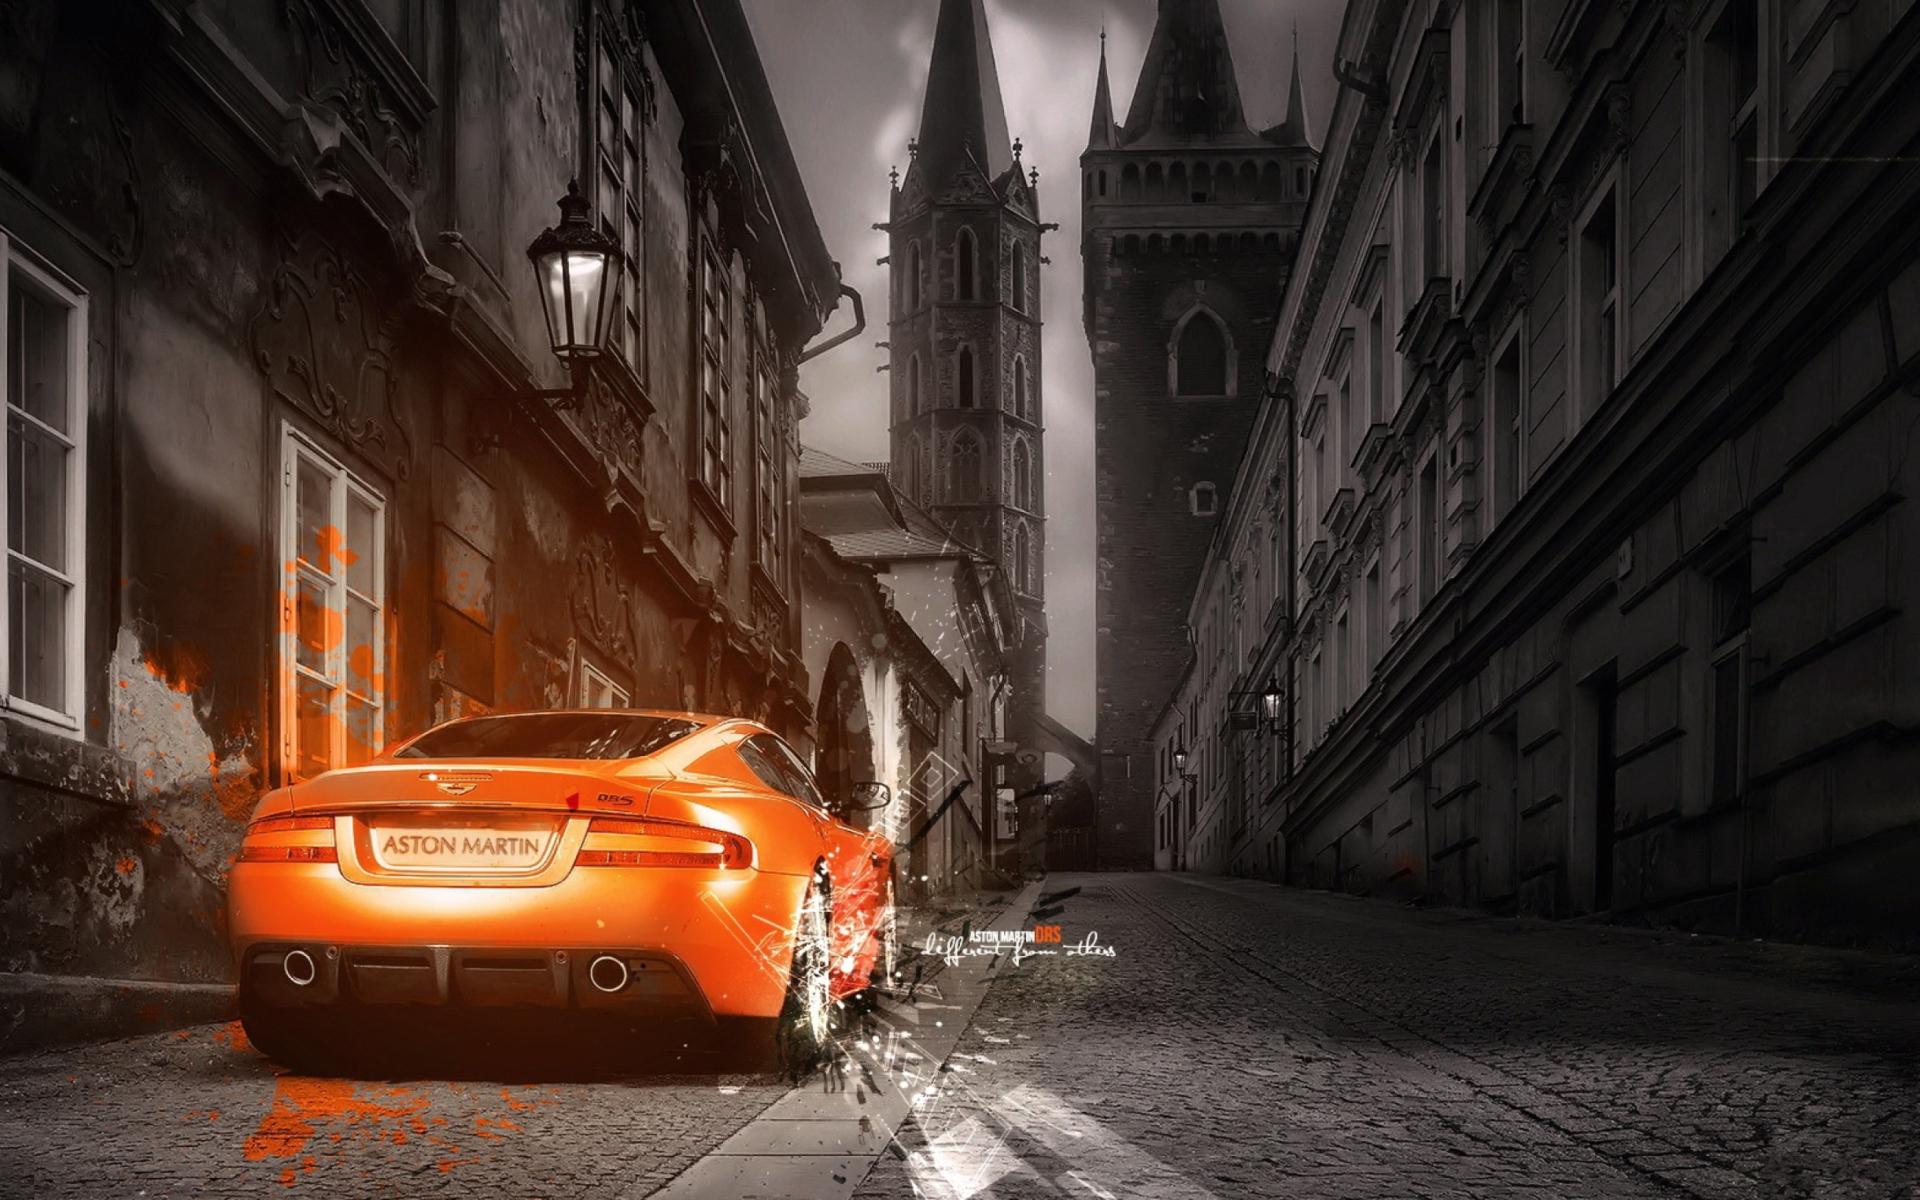 Aston Martin суперкар ночь город  № 2374779 бесплатно